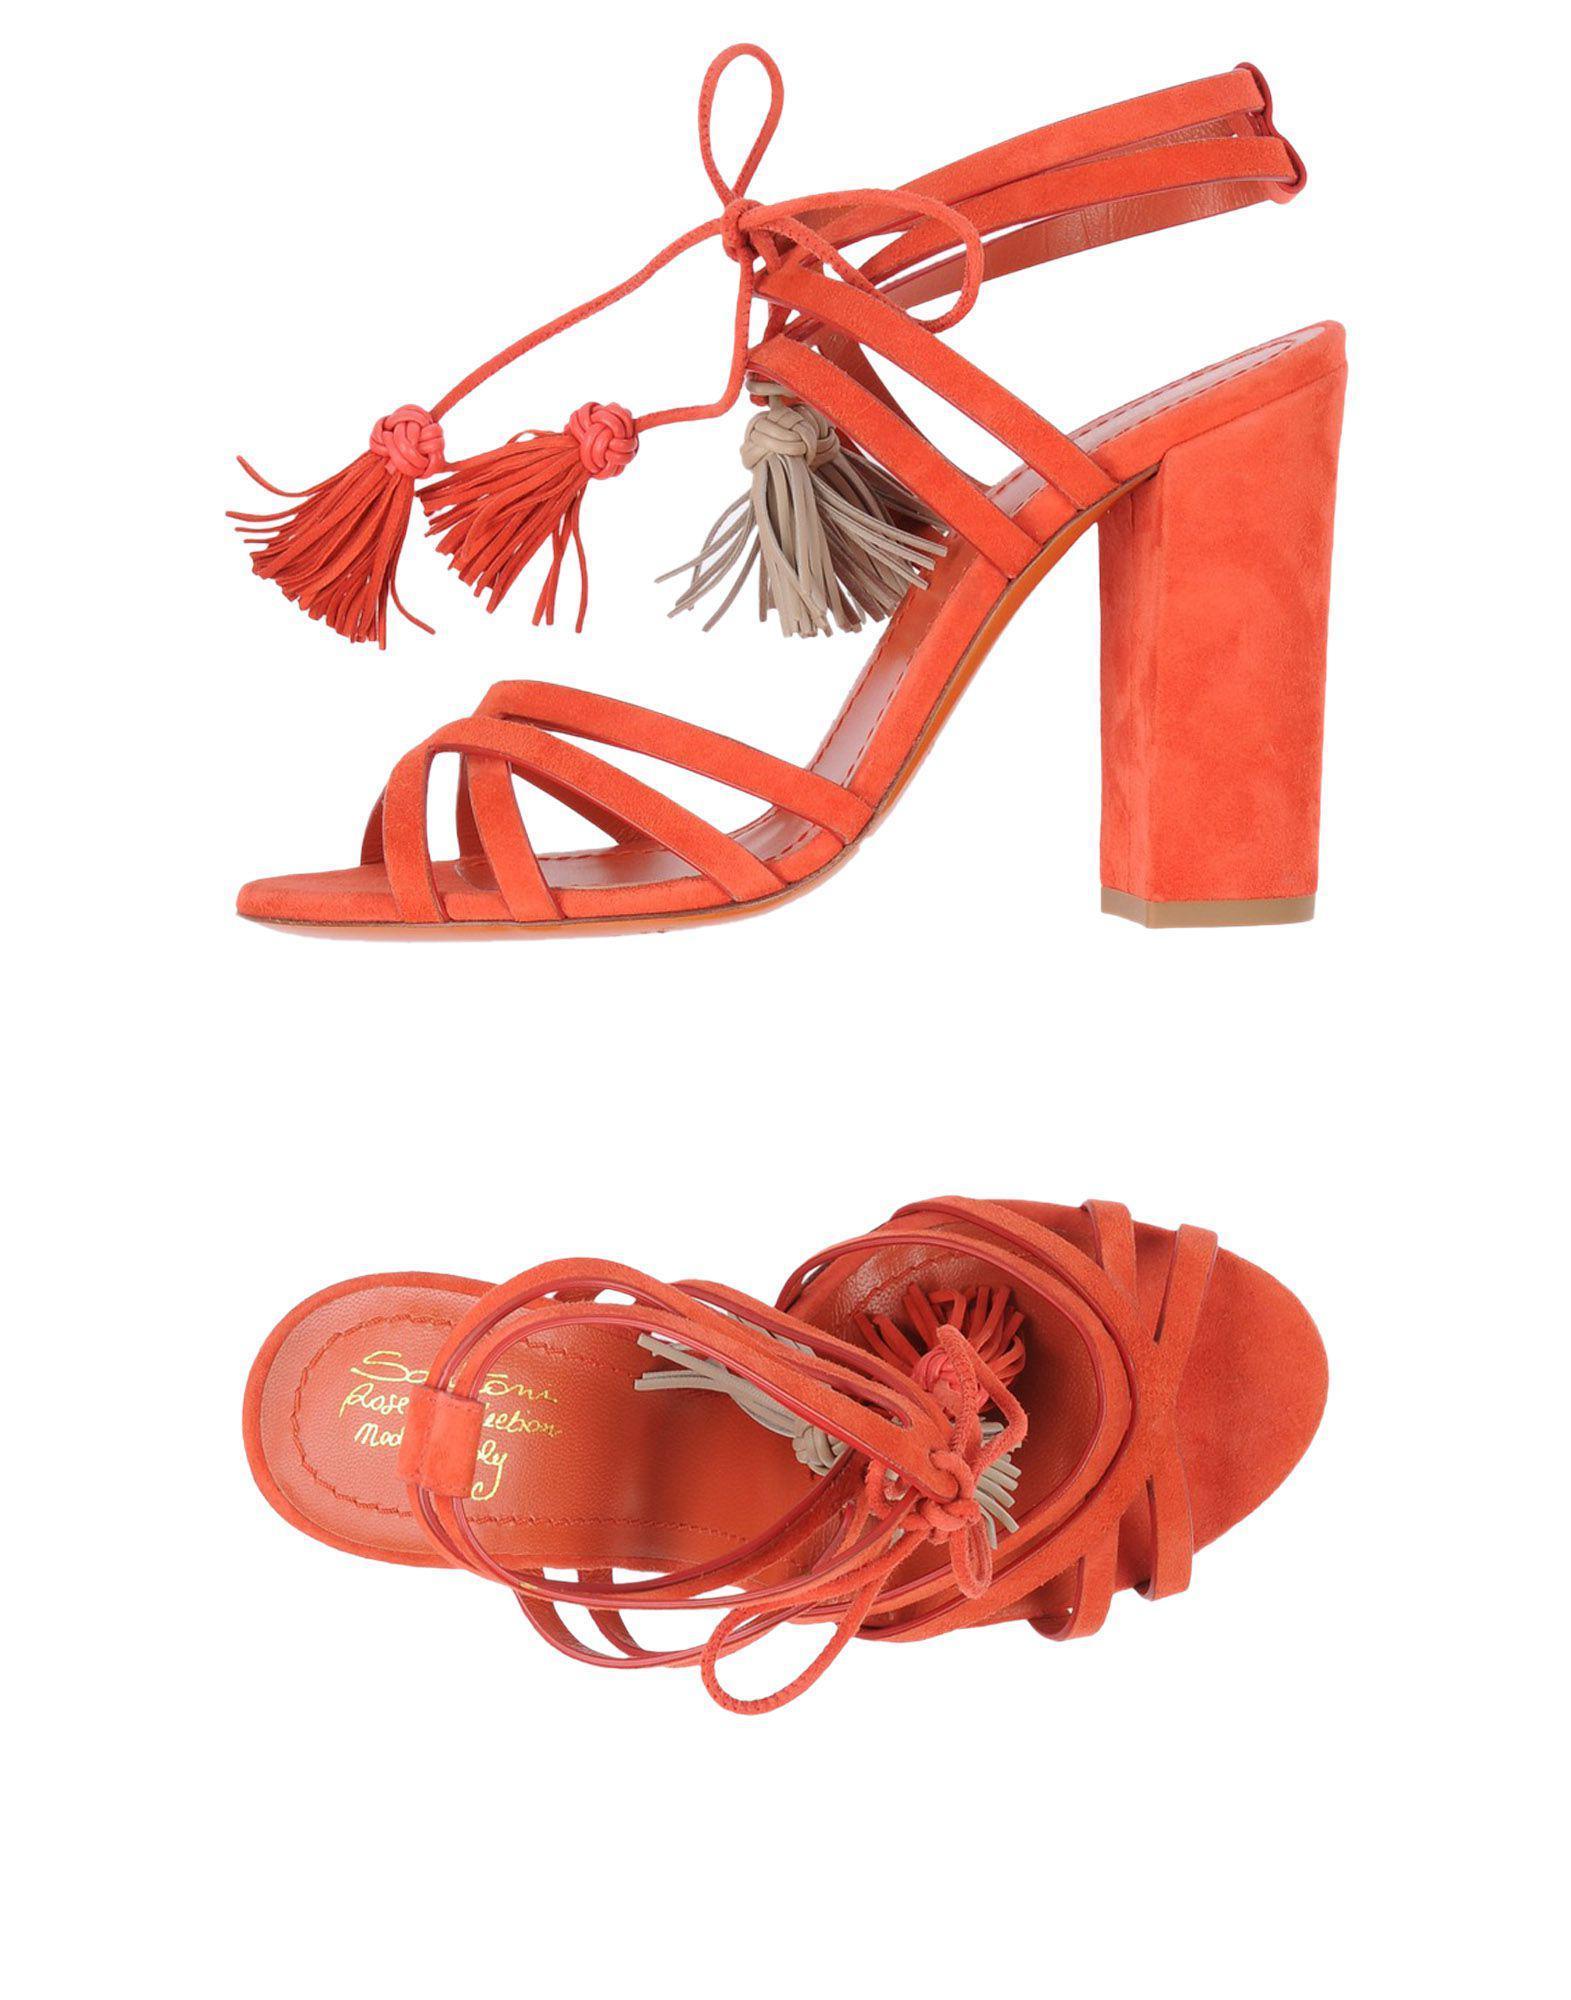 cd948529f55 Lyst - Santoni Sandals in Red